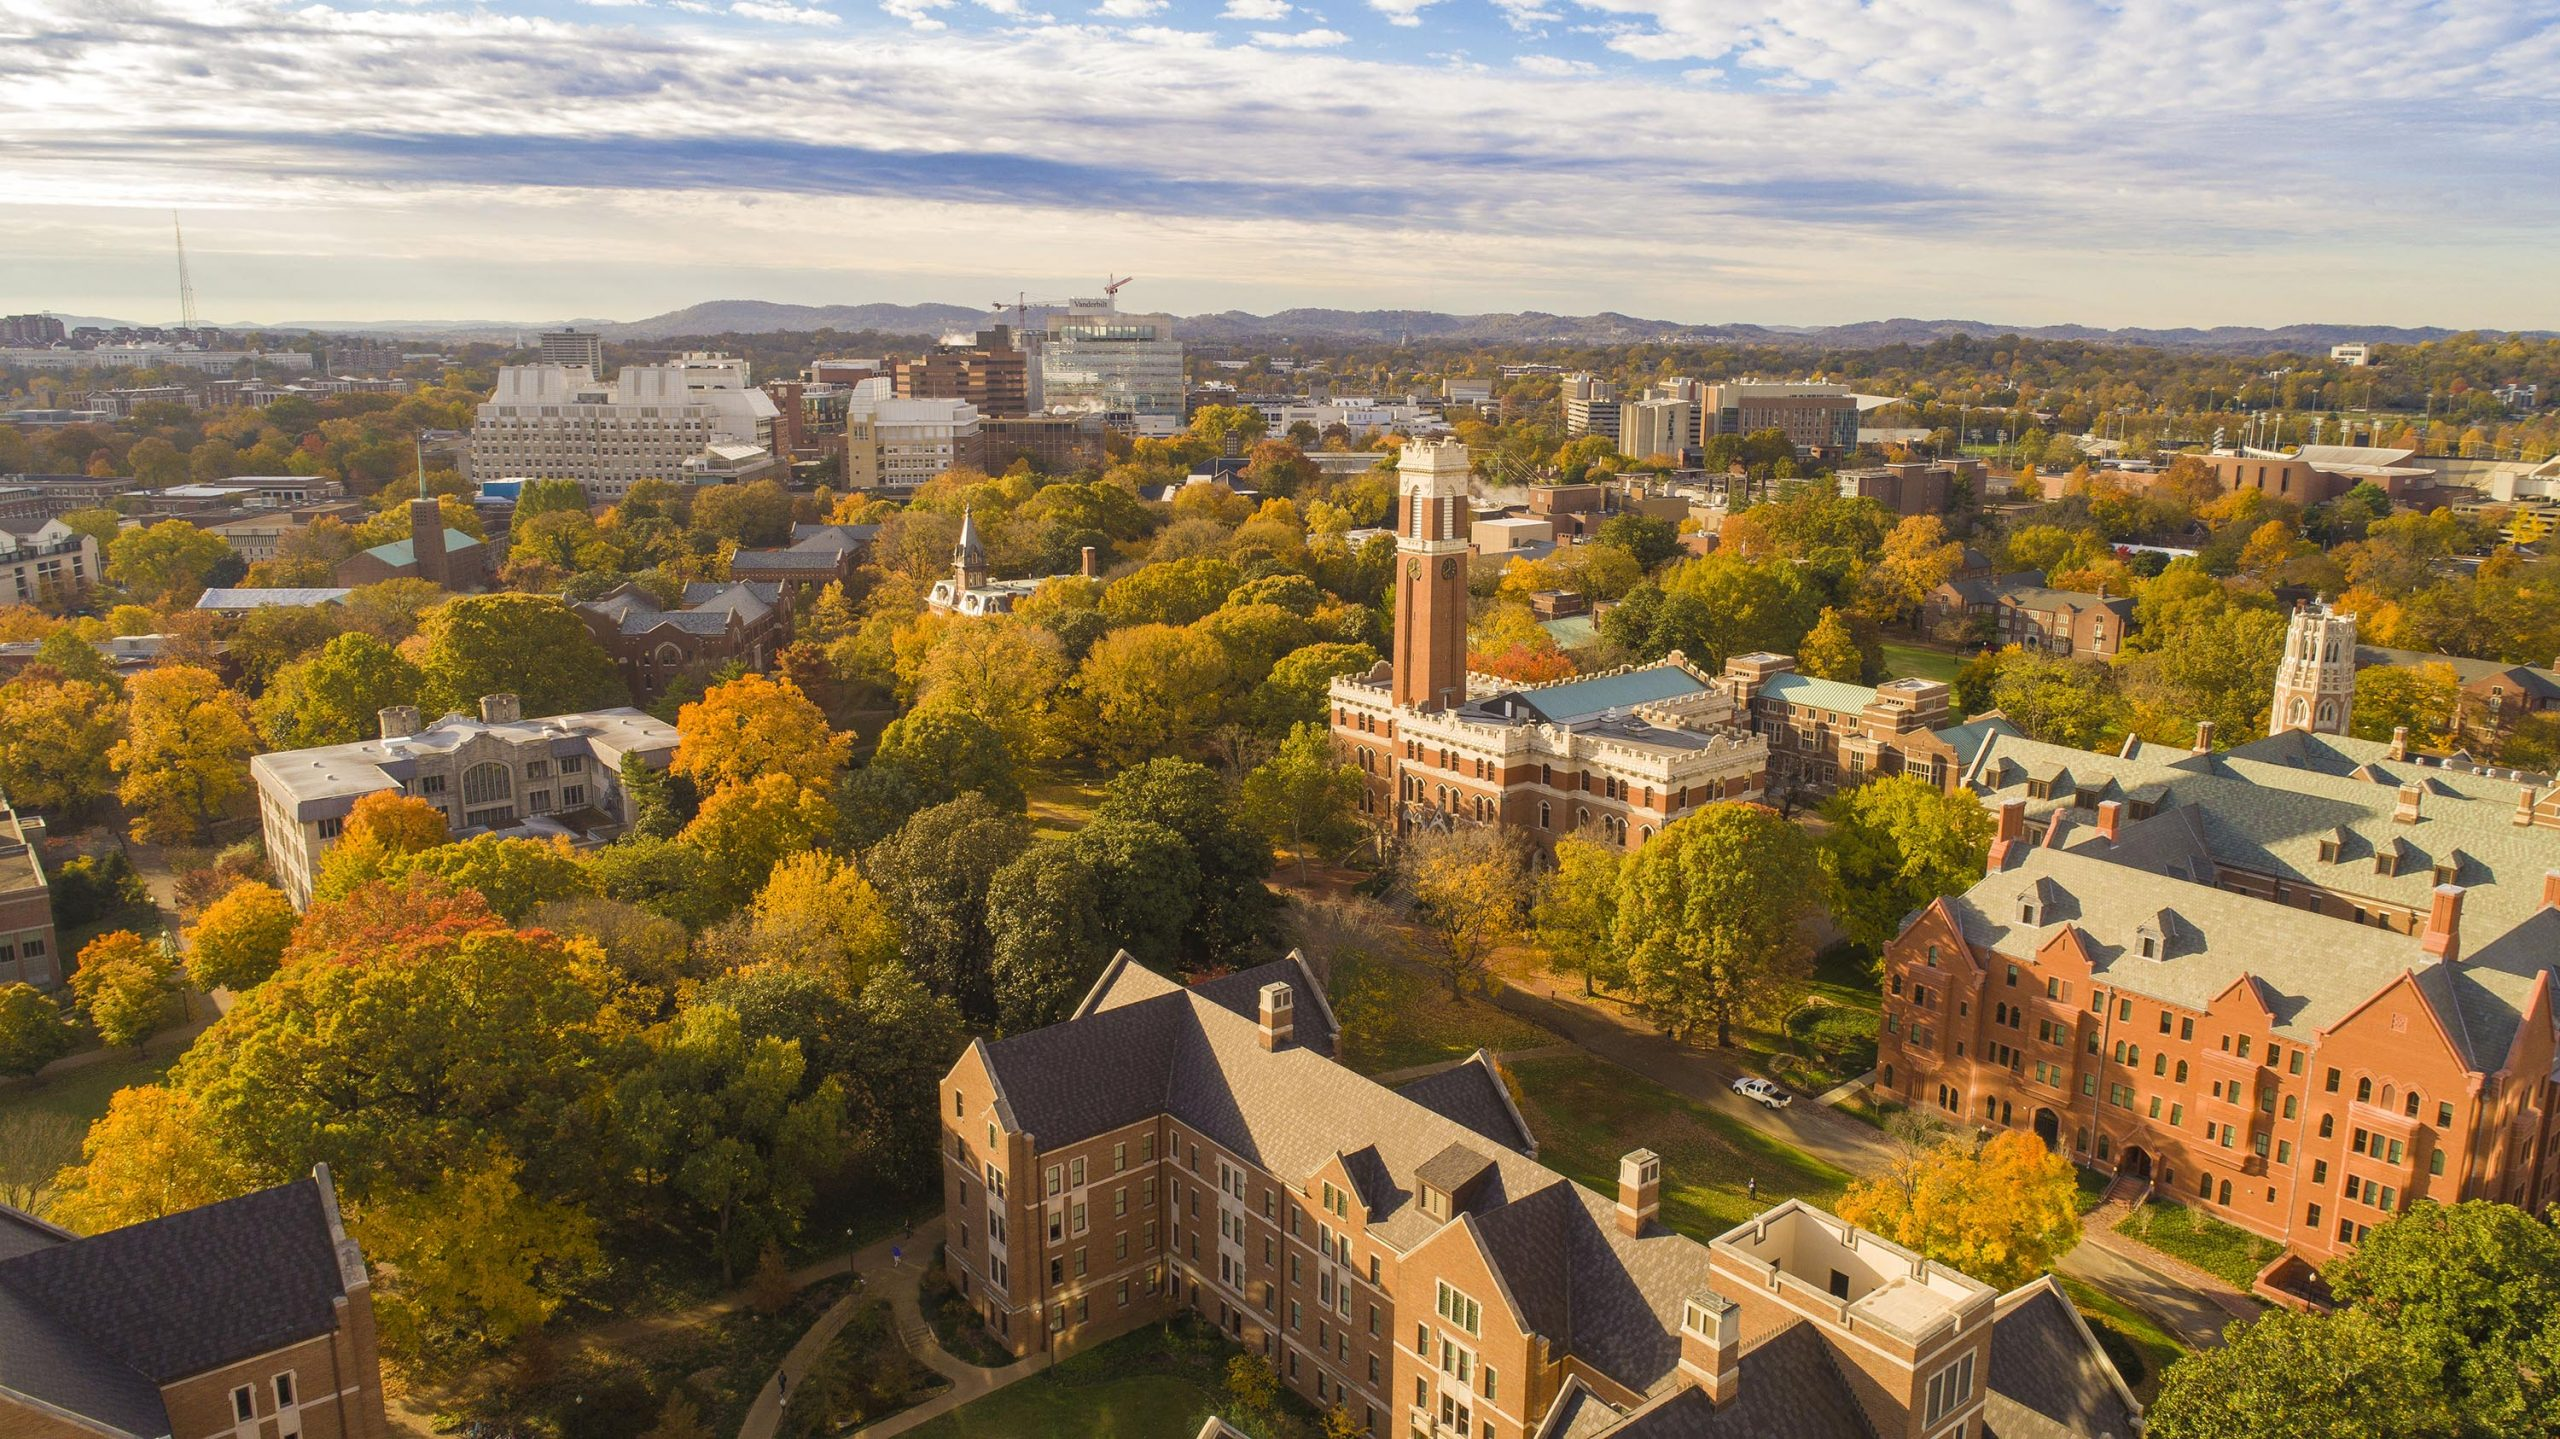 Aerial images of Vanderbilt Campus and Kirkland Hall